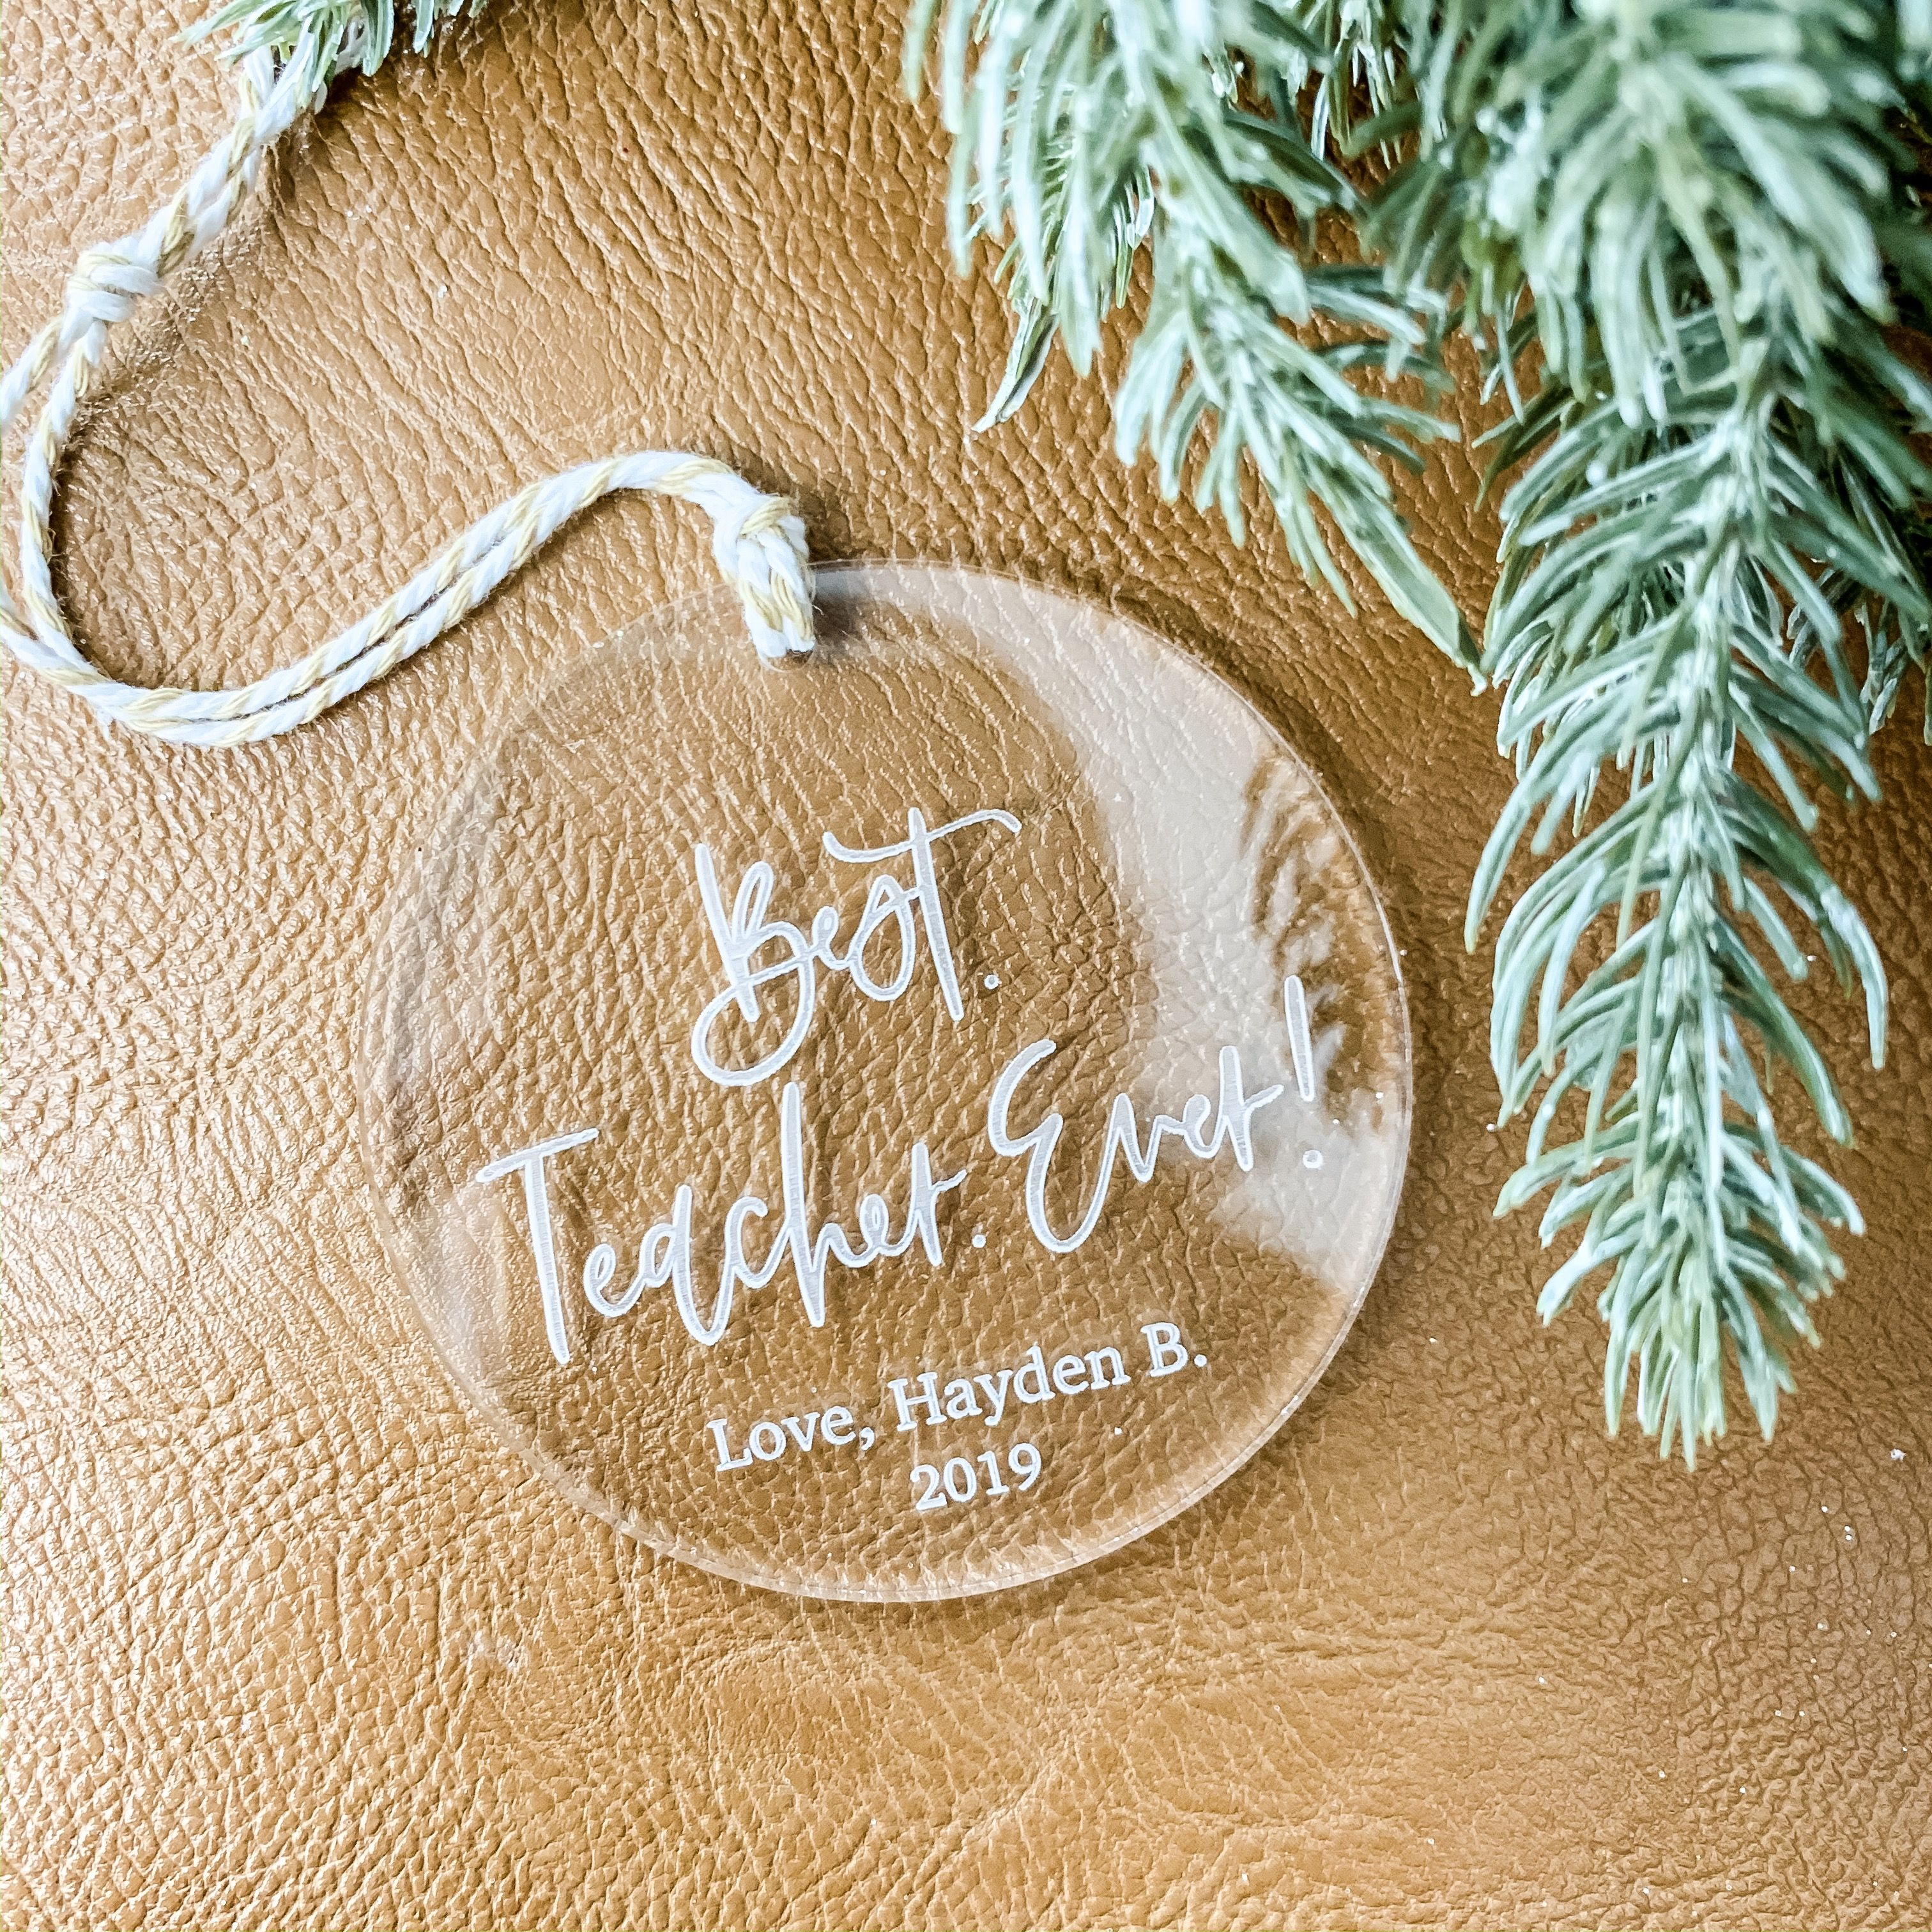 Best Teacher Ever Engraved Ornament Personalized Teacher Etsy In 2020 Teacher Christmas Gifts Engraved Christmas Ornaments Personalized Teacher Gifts